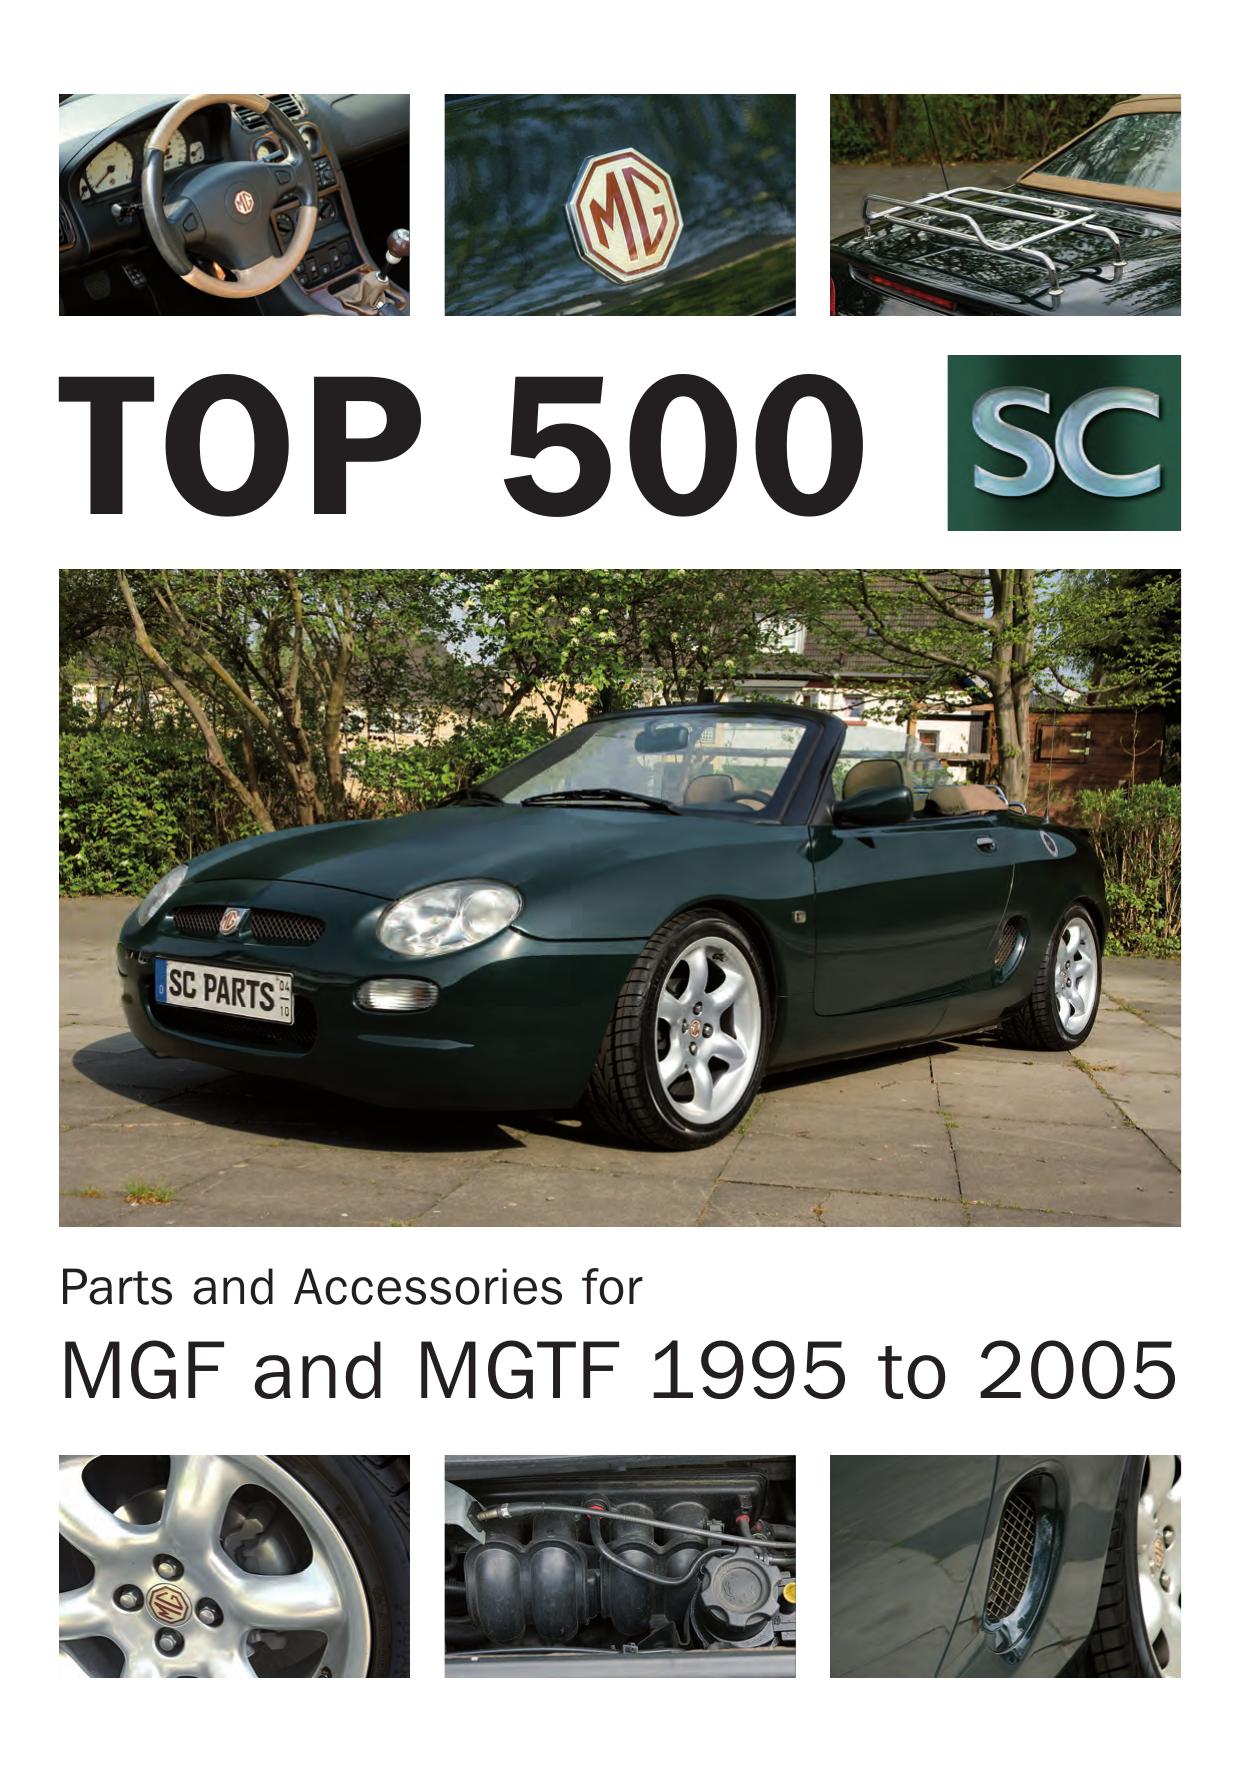 MGF MG-F 1.6 1.8 VVC REAR BRAKE DISCS /& PADS SET 1995-2001 240mm Solid